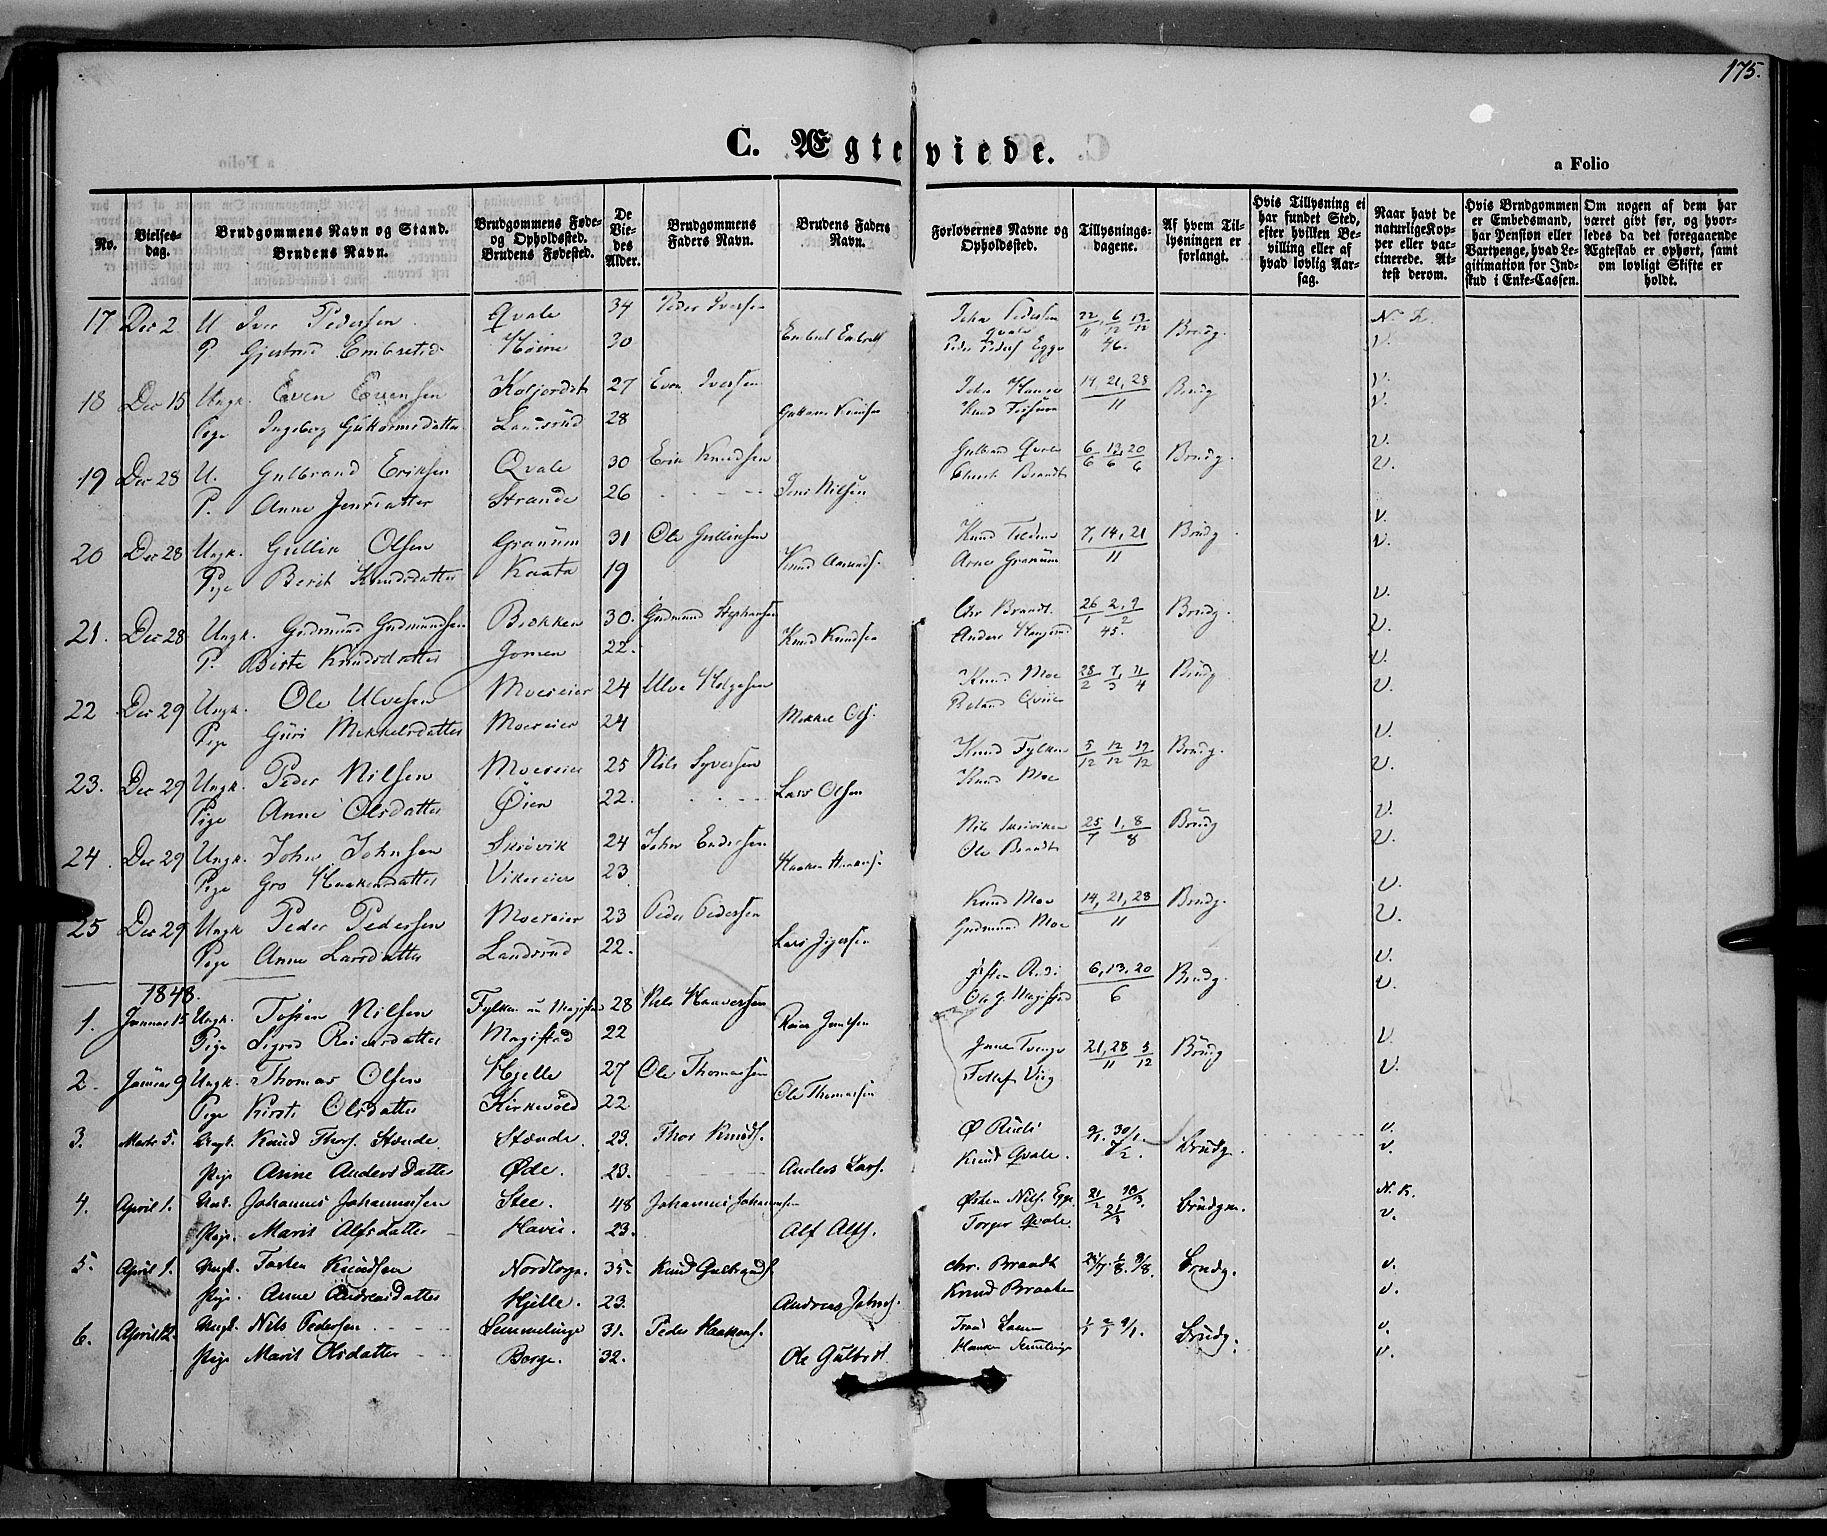 SAH, Vestre Slidre prestekontor, Ministerialbok nr. 1, 1844-1855, s. 175